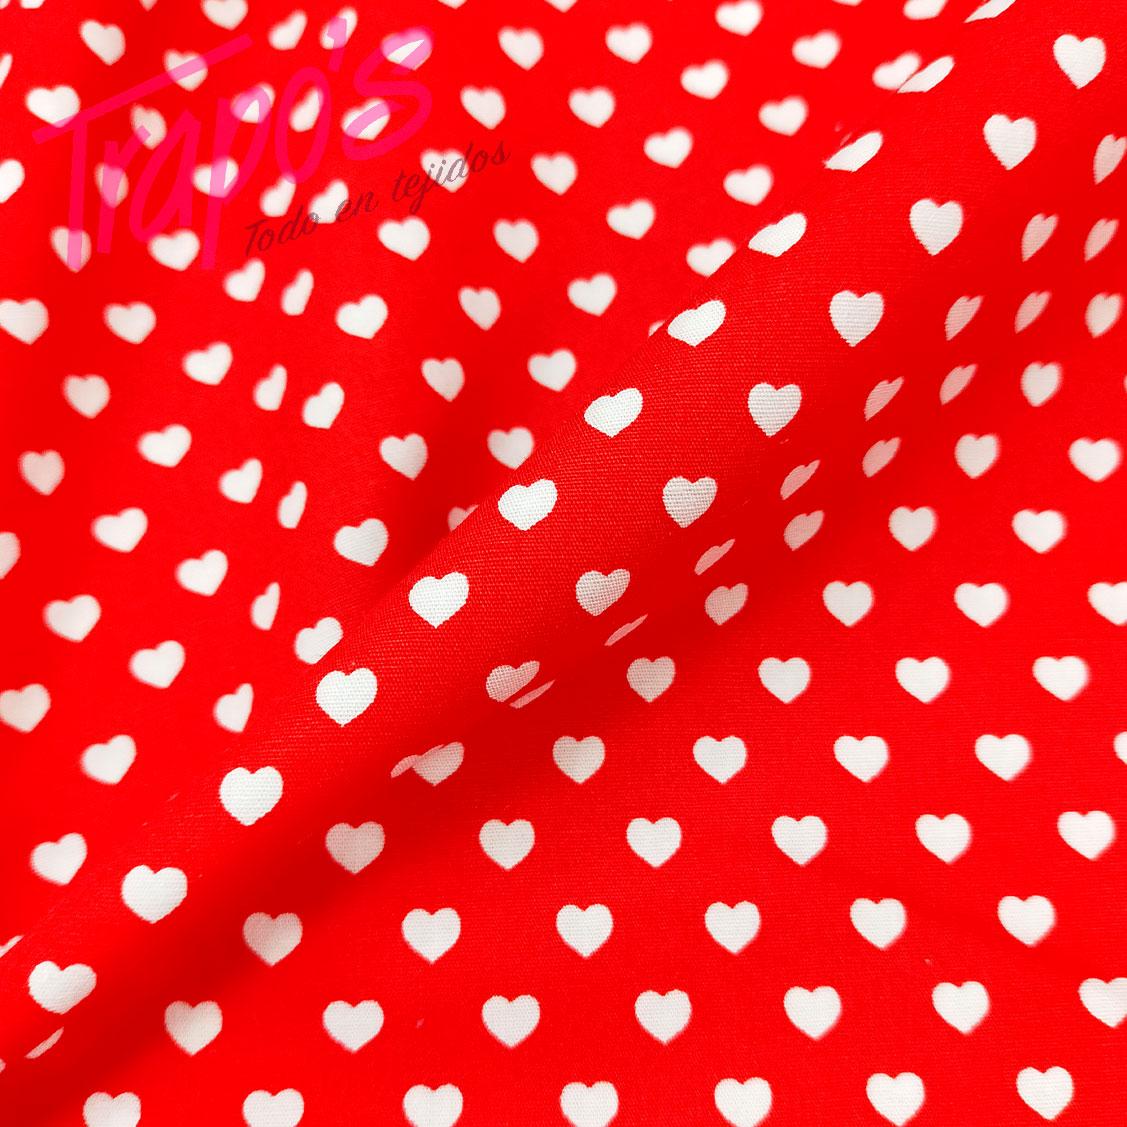 corazon-rojo3